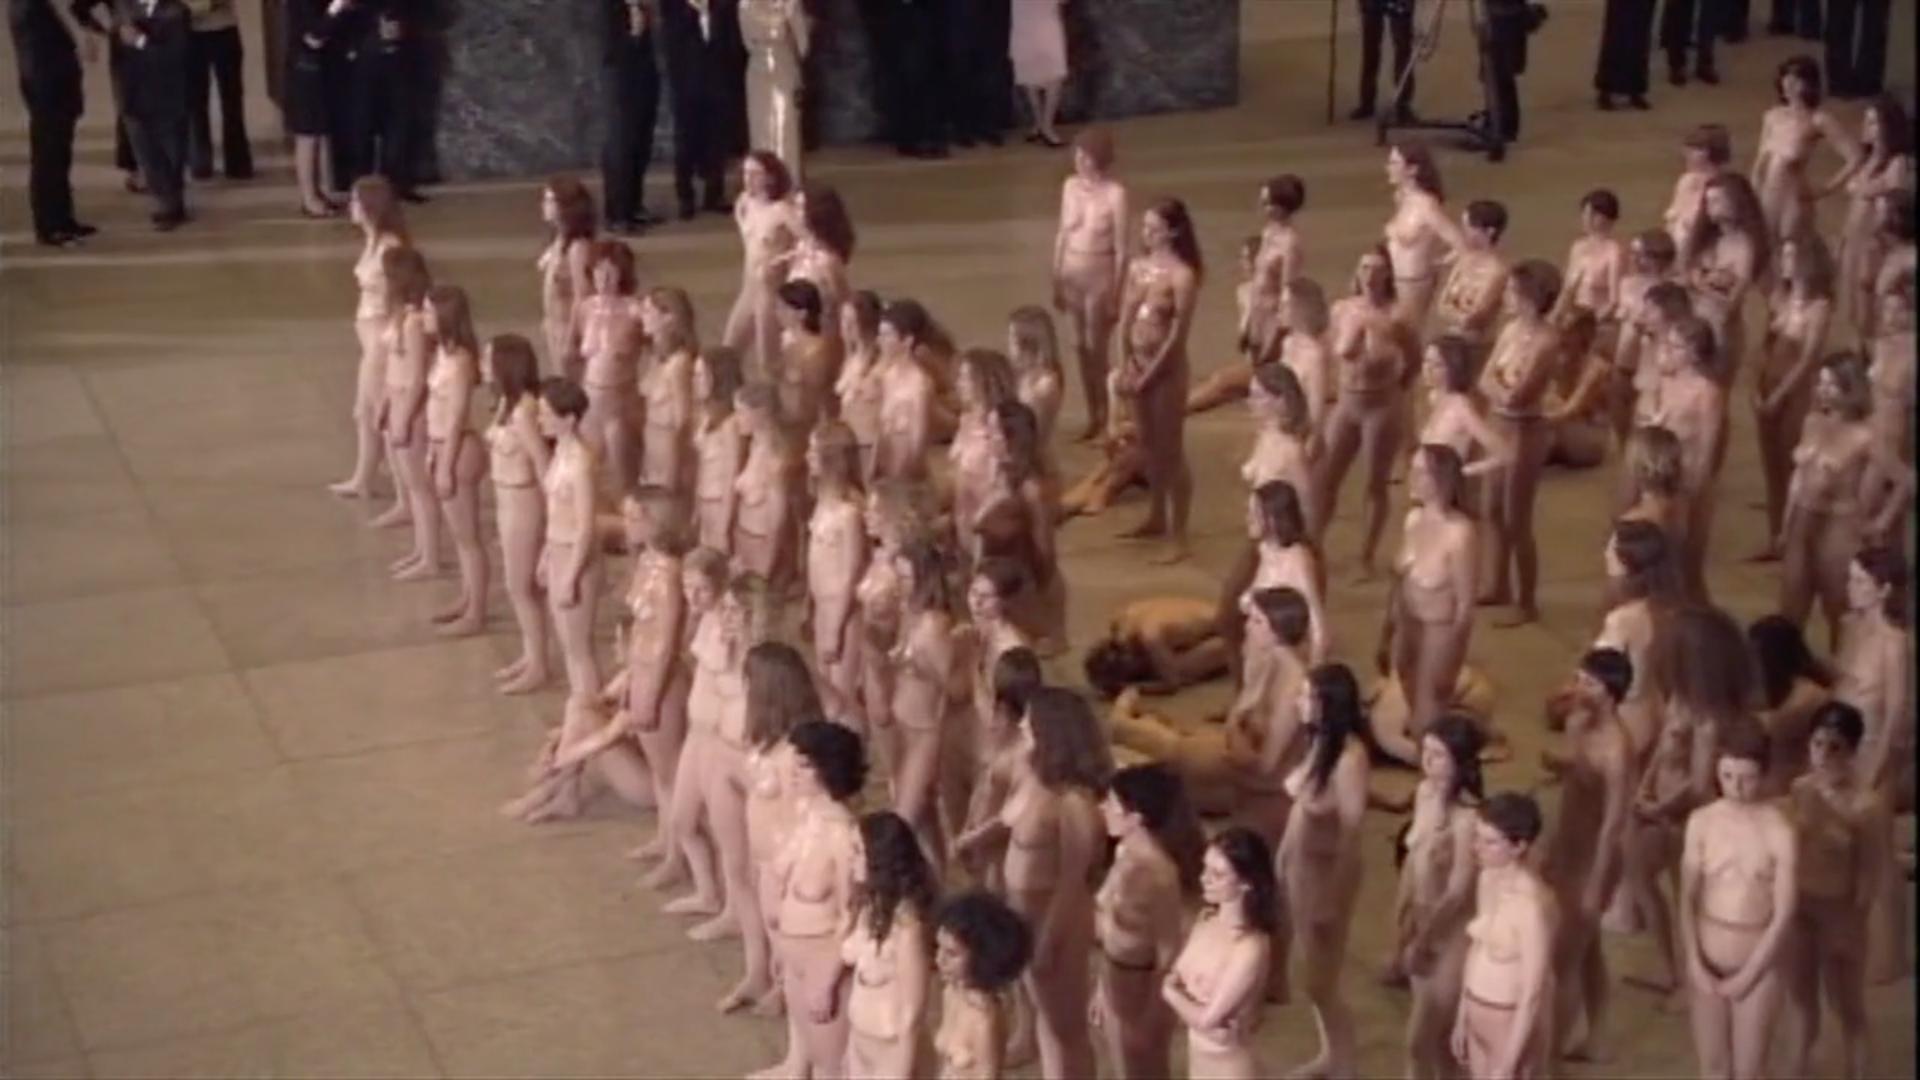 100 Years of Performance Art